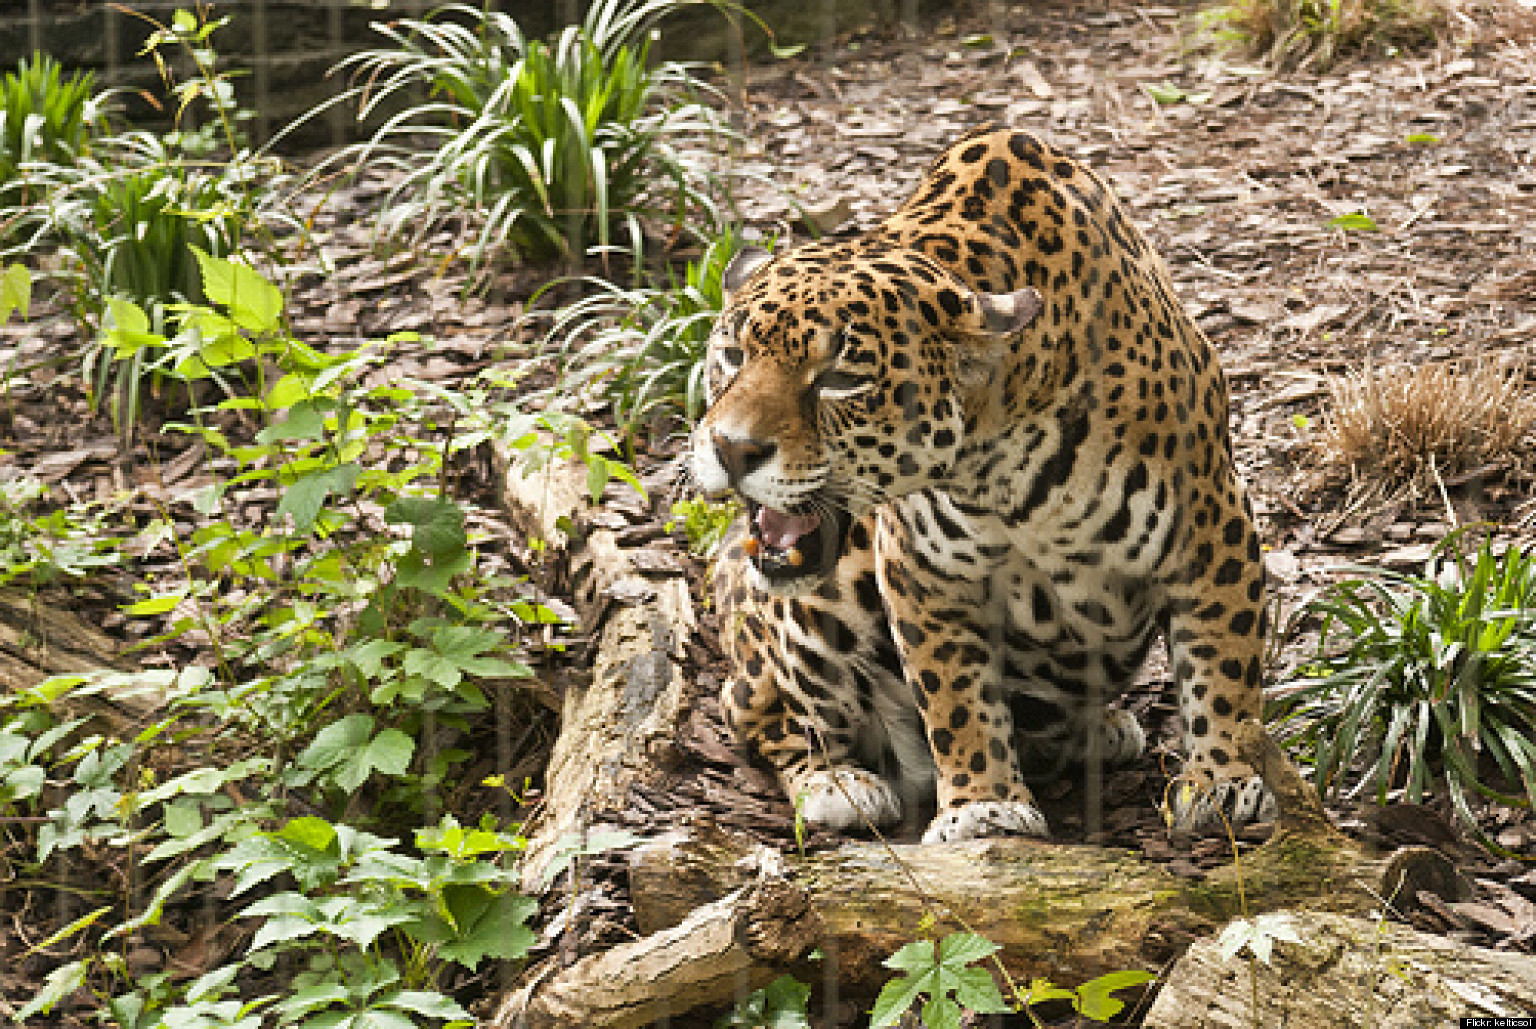 Hamptons Jaguar On The Loose? Officers Investigating ...